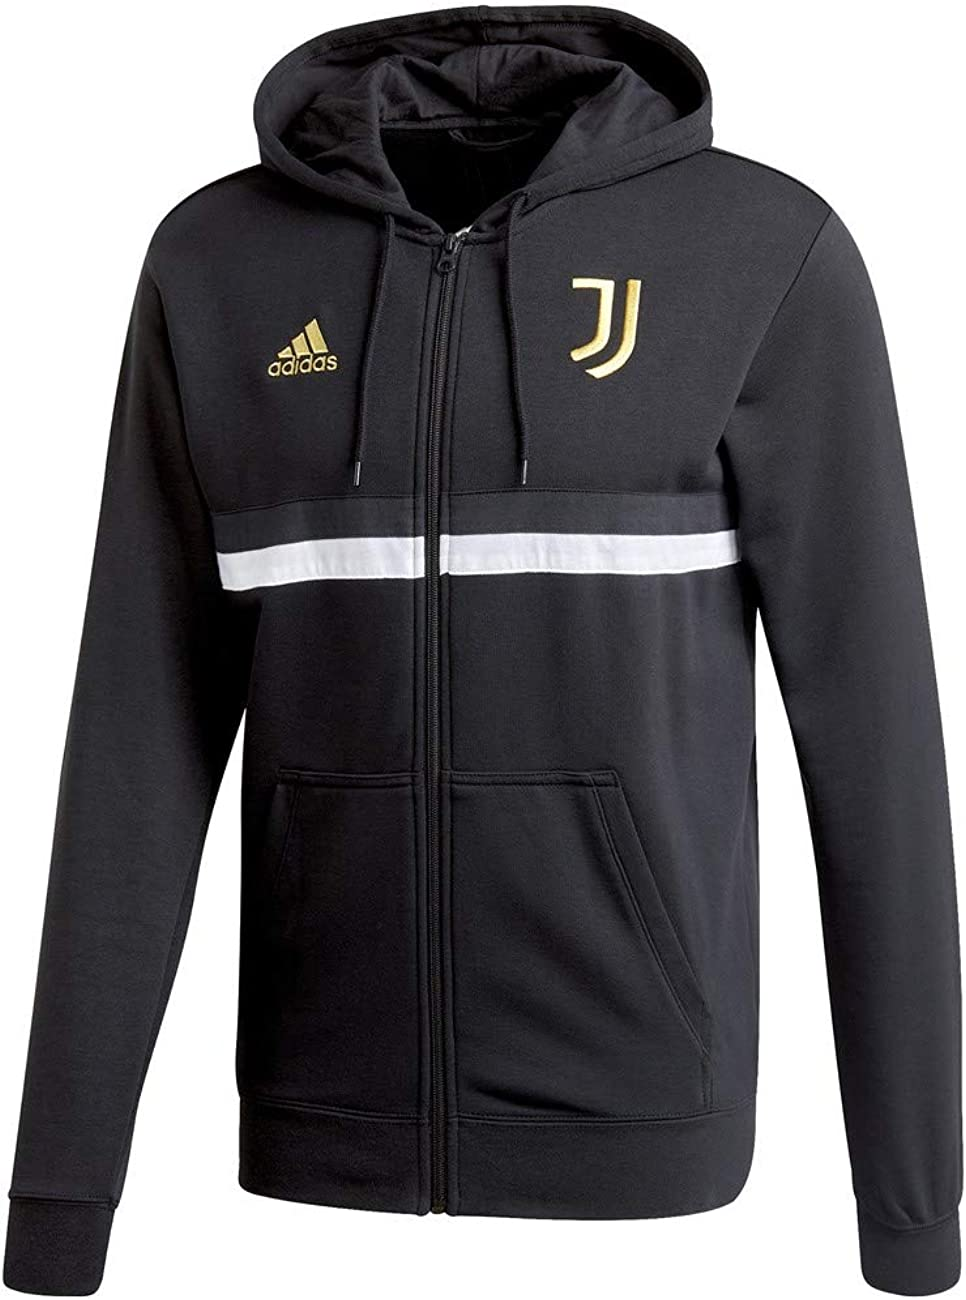 adidas Men's Finally popular brand Juventus Full-Zip Popular brand in the world 3-Stripes Hoodie